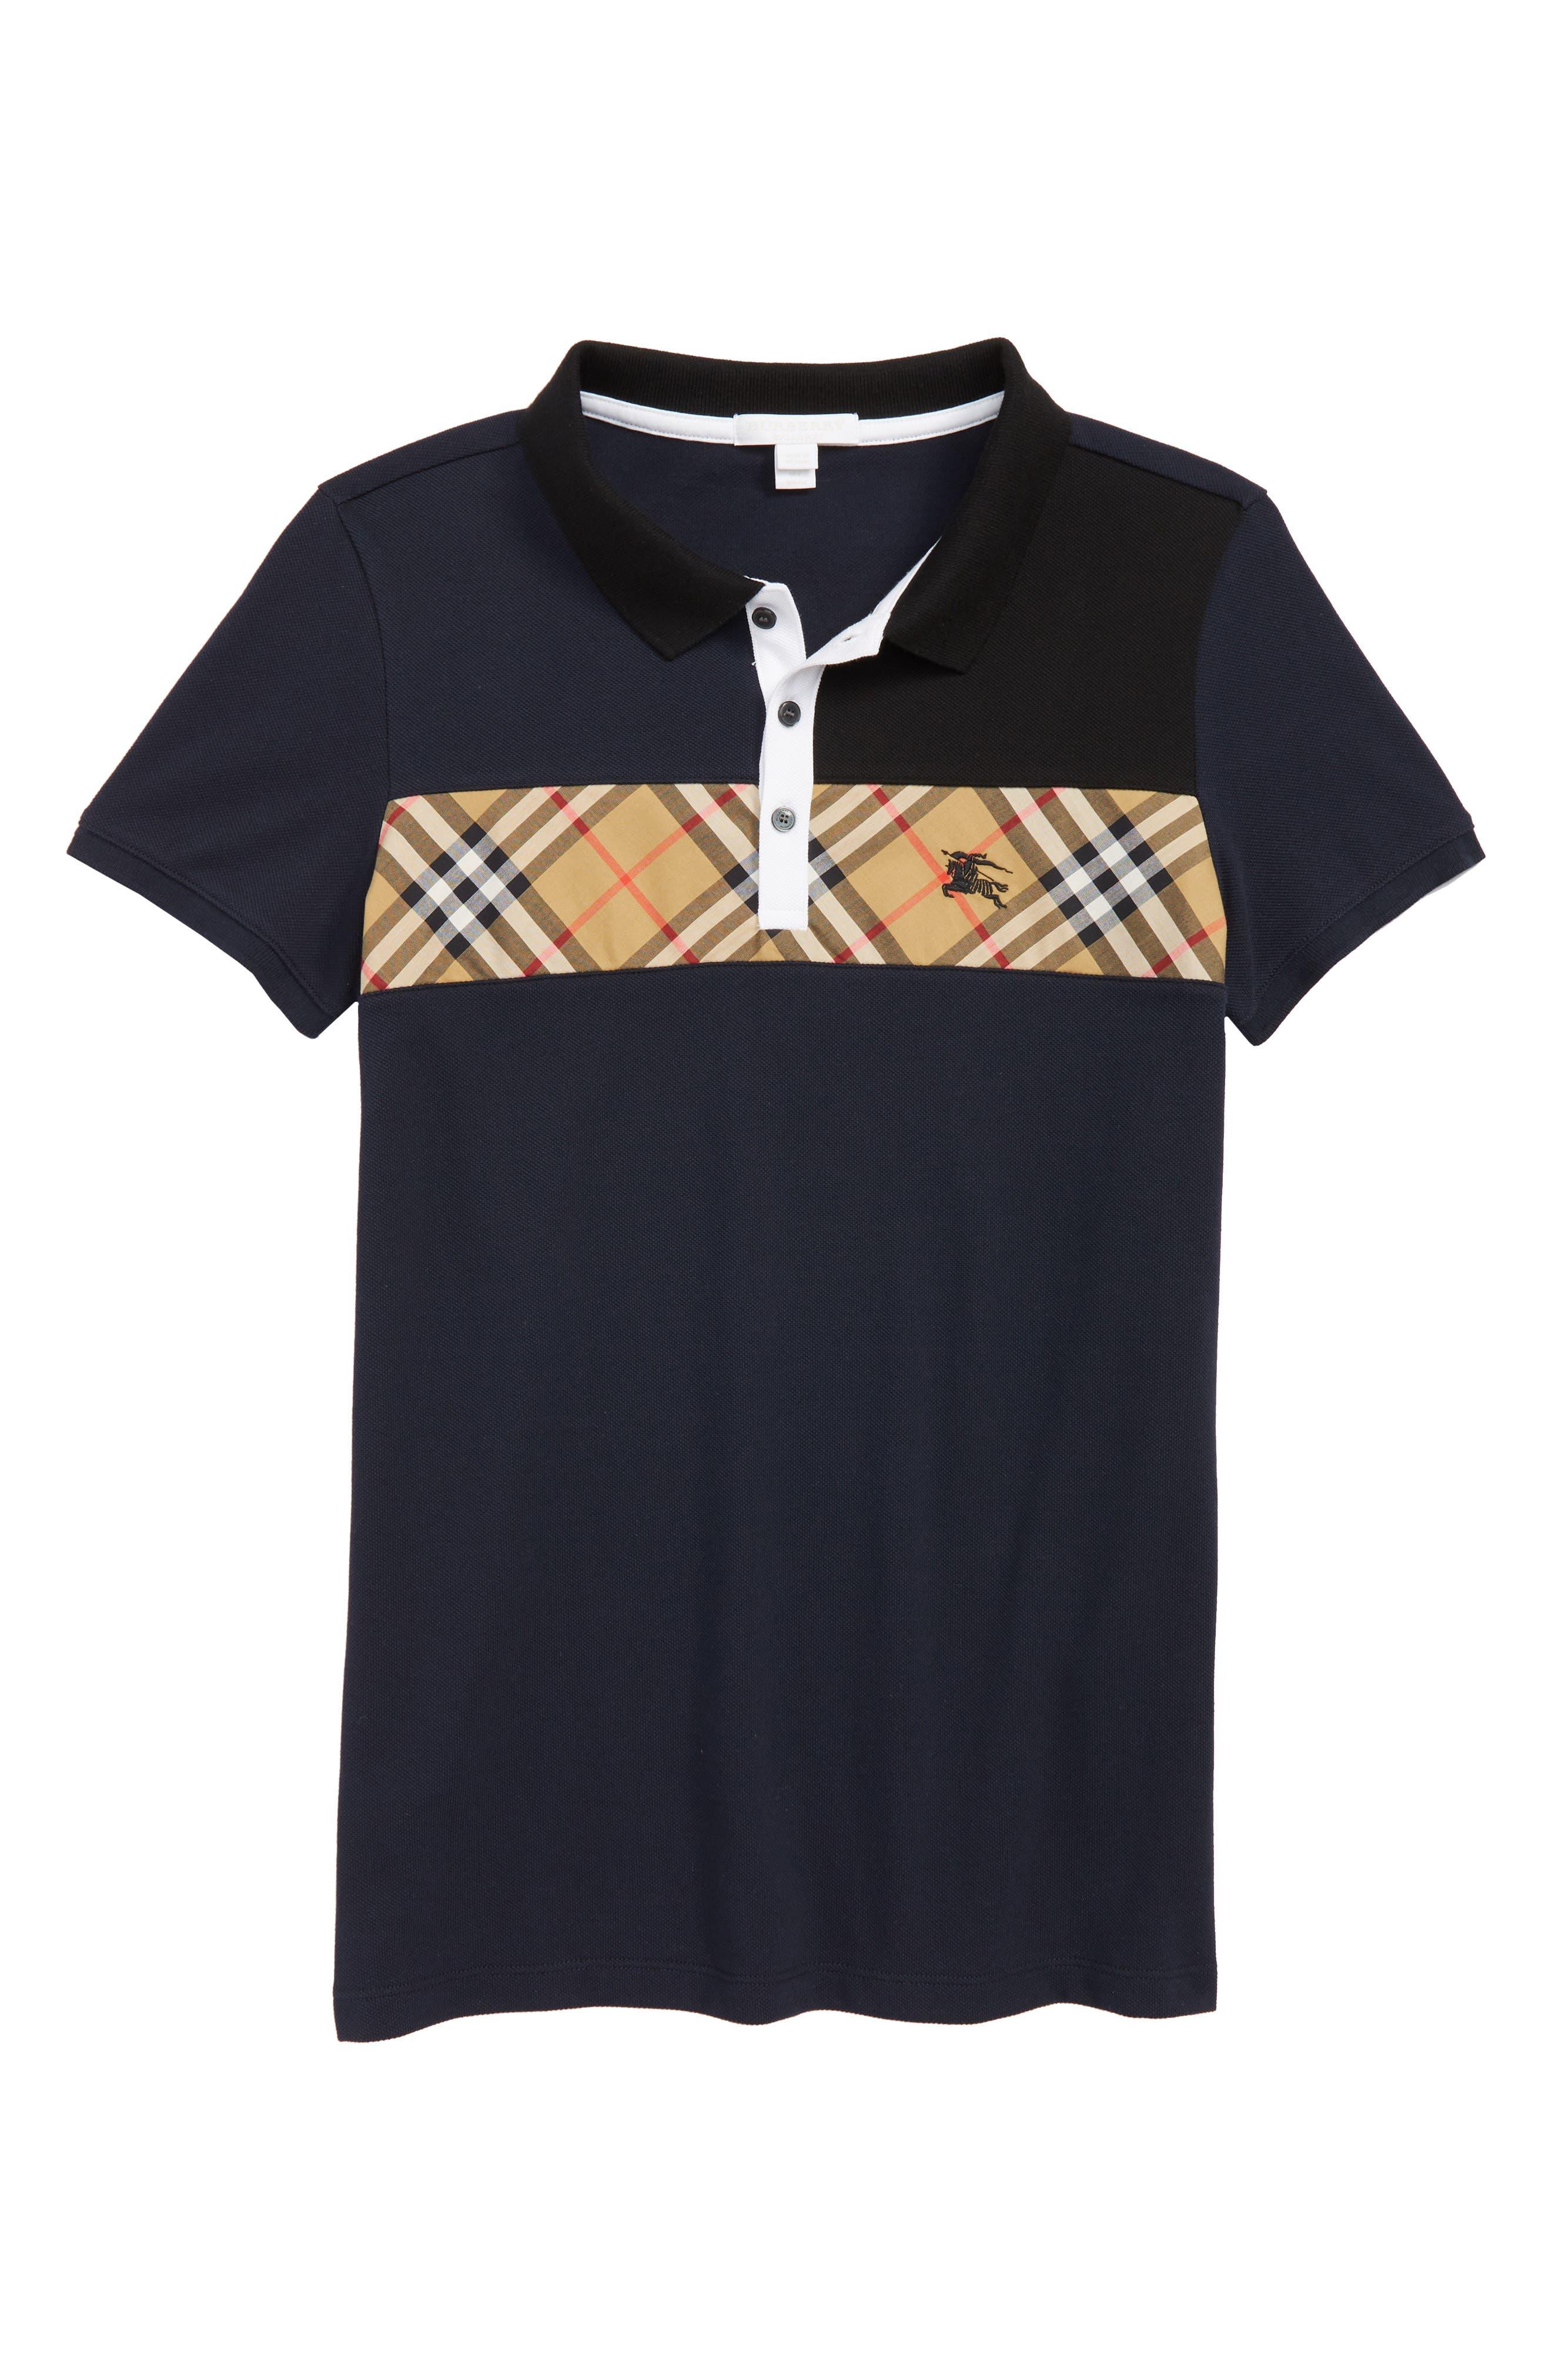 Craghoppers Bear BRND Car Childrens T-Shirt Boys Girls CKT639